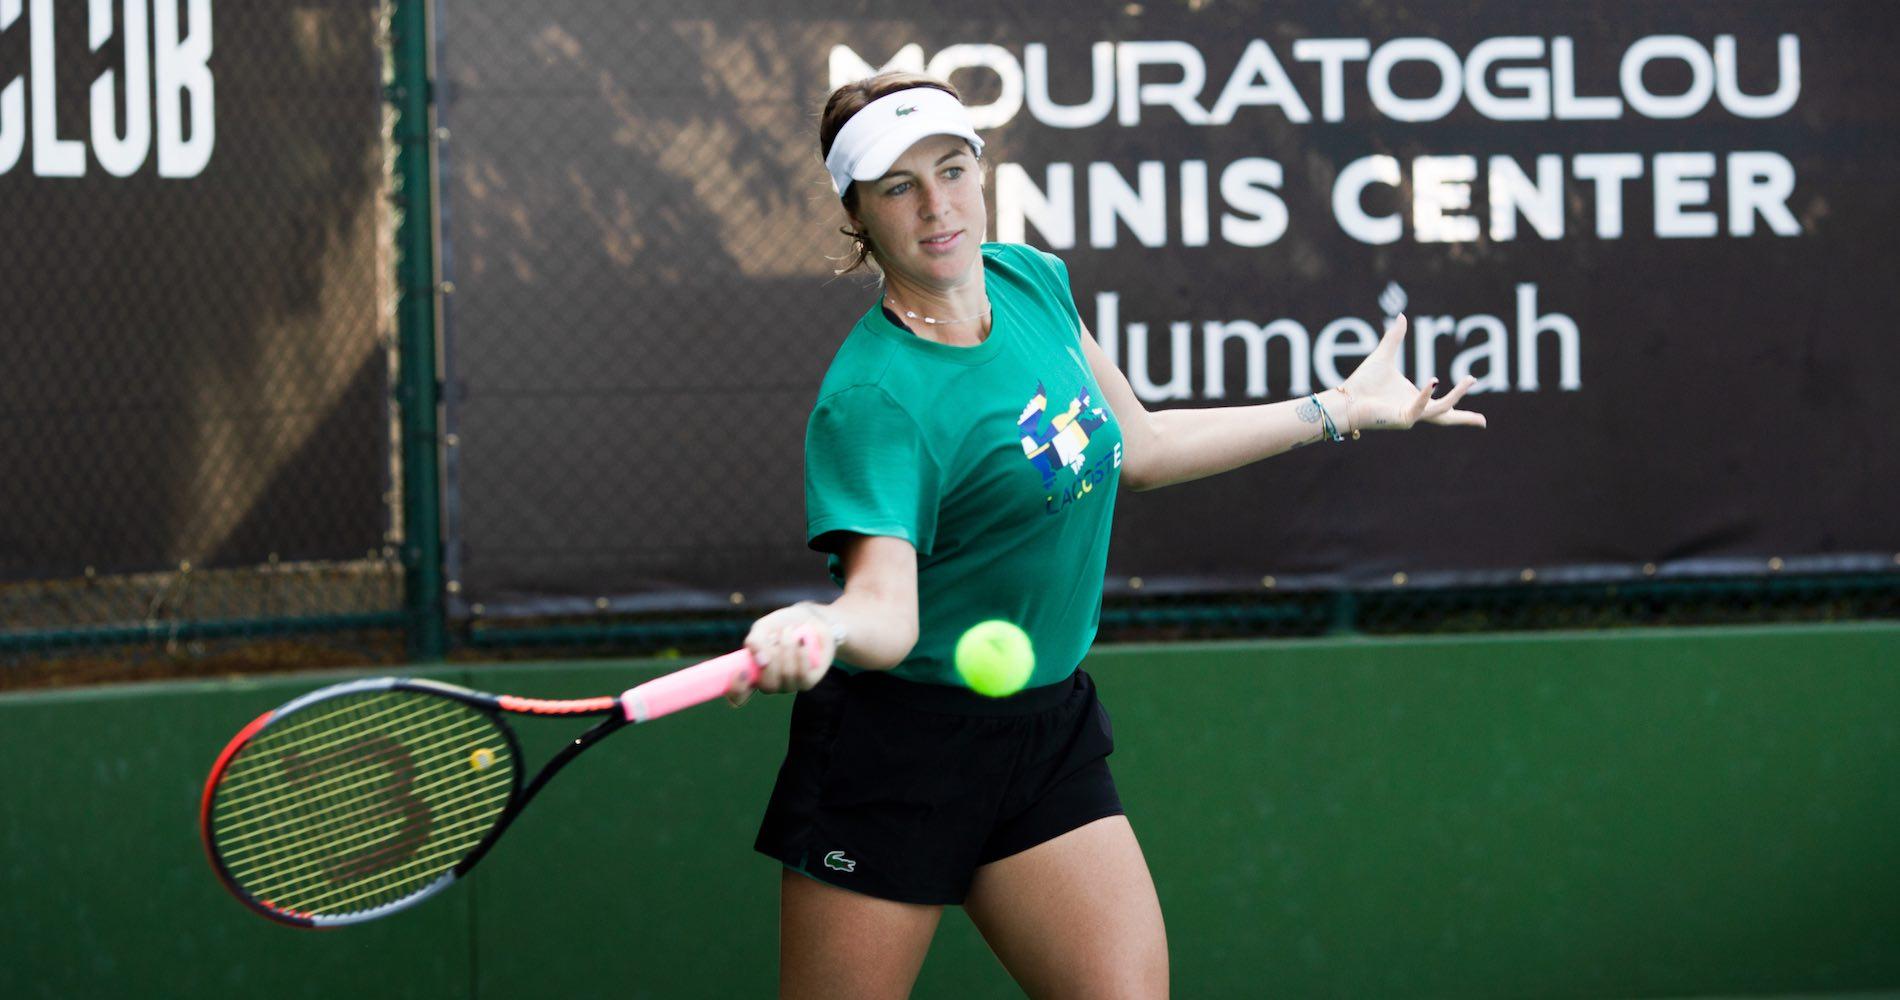 Anastasia Pavluychenkova, Mouratoglou tennis center, Dubaï, dec. 2020